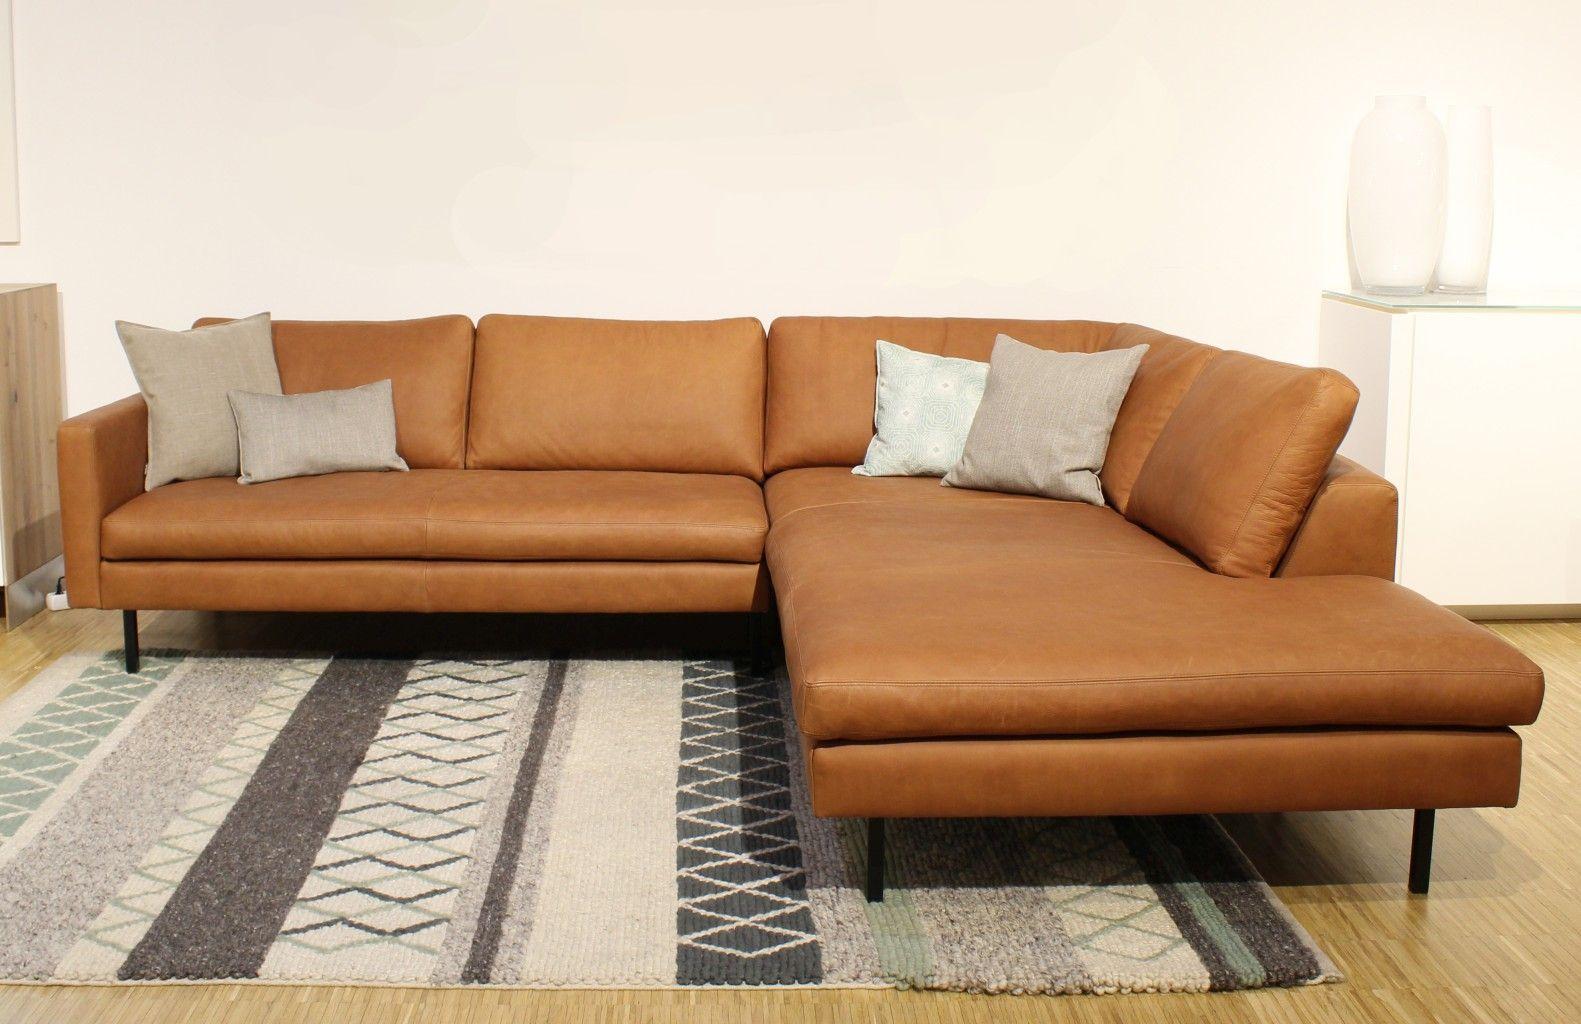 Tommy M Ecksofa Manhatten Leder Xooonbetaalbaardesign Couch Sofa Interior Furniture